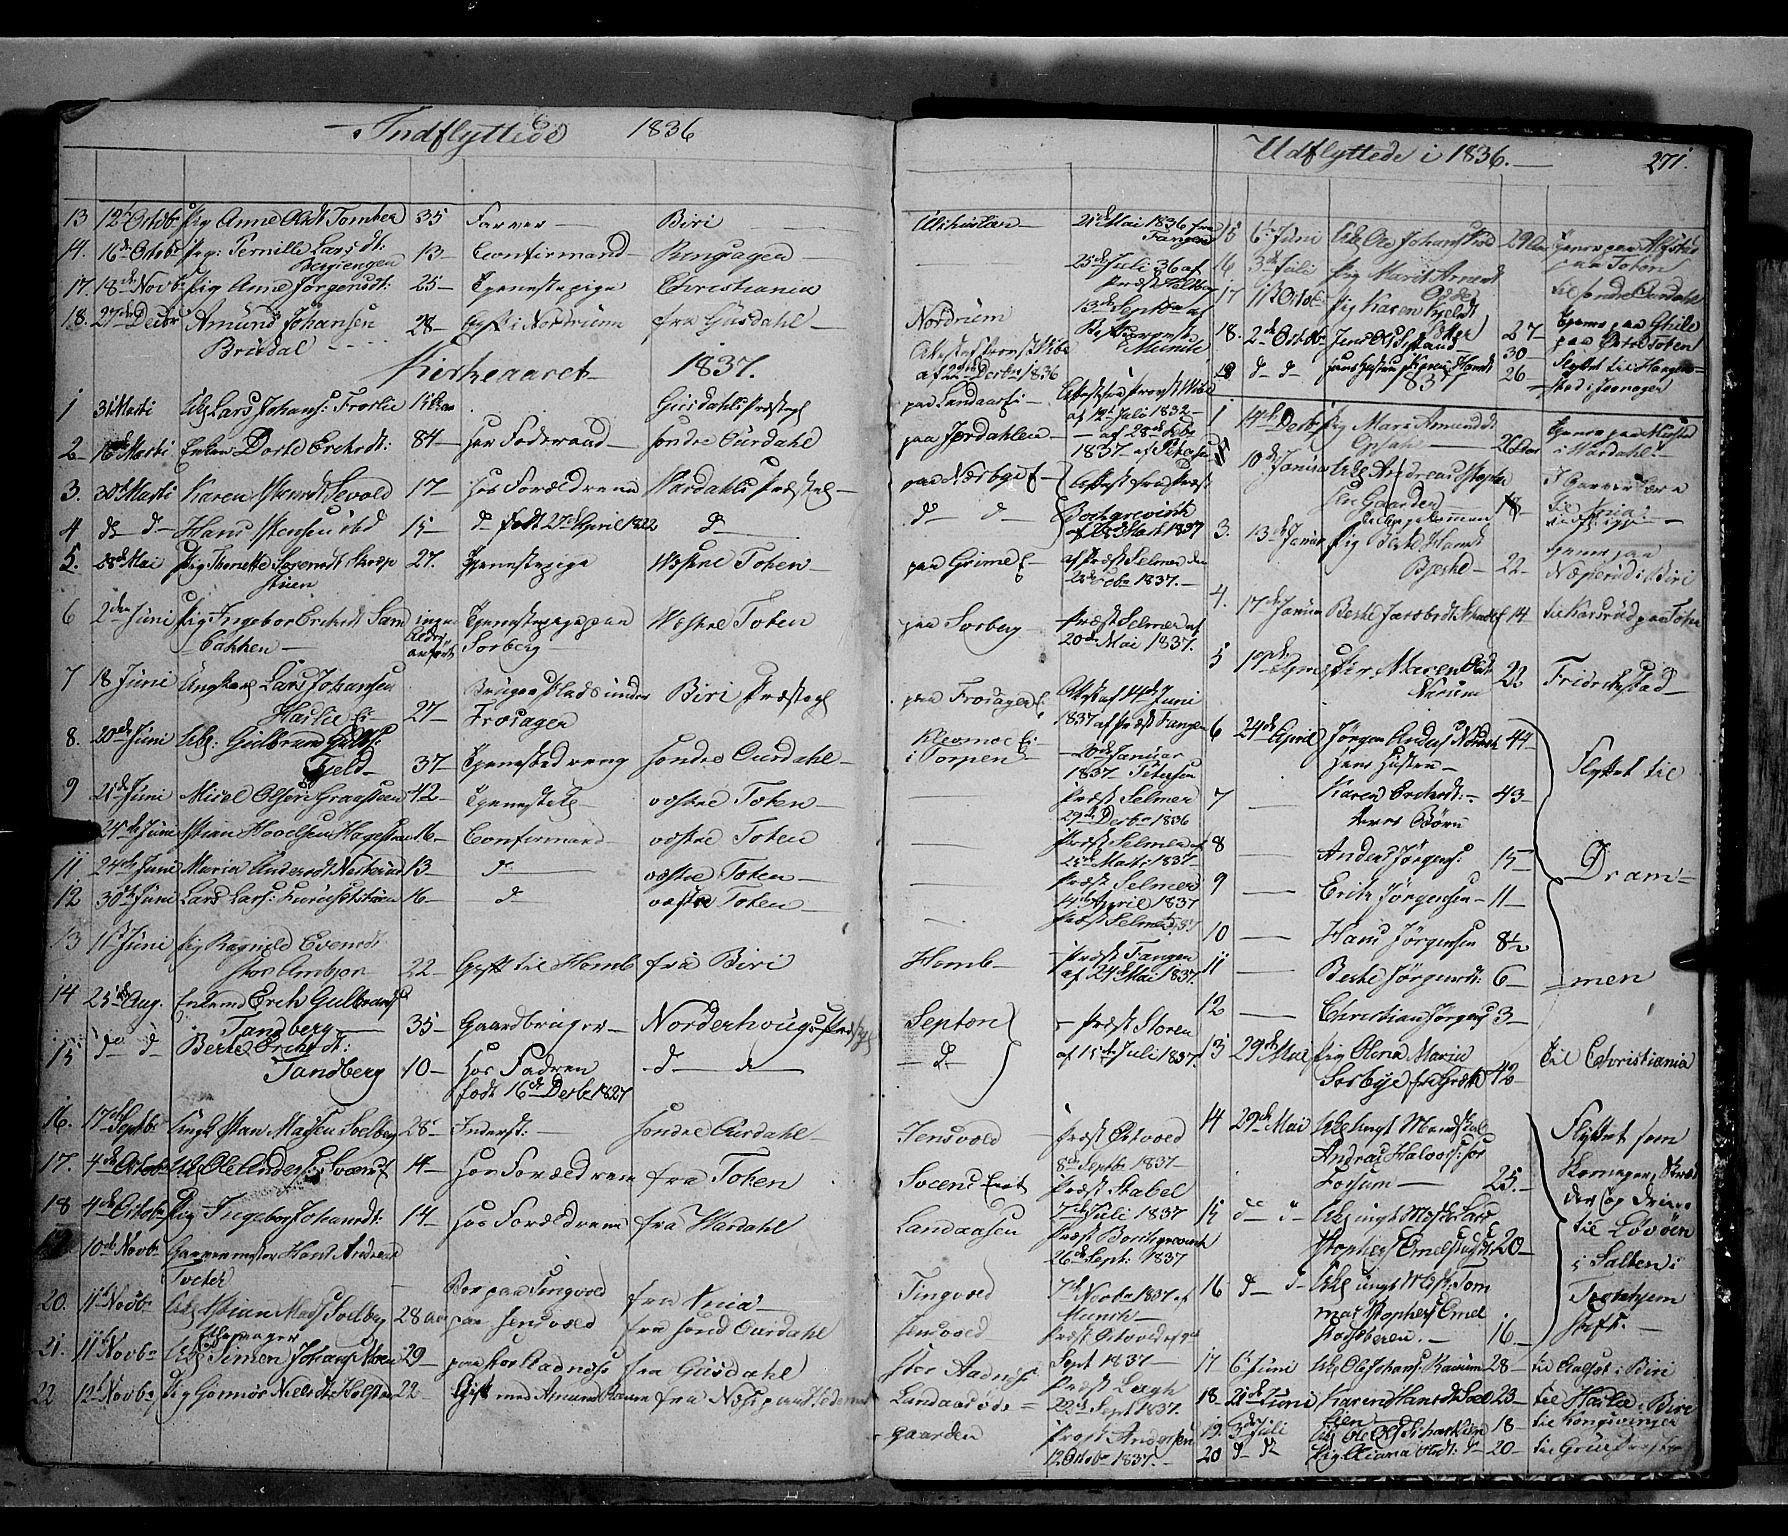 SAH, Land prestekontor, Klokkerbok nr. 2, 1833-1849, s. 271